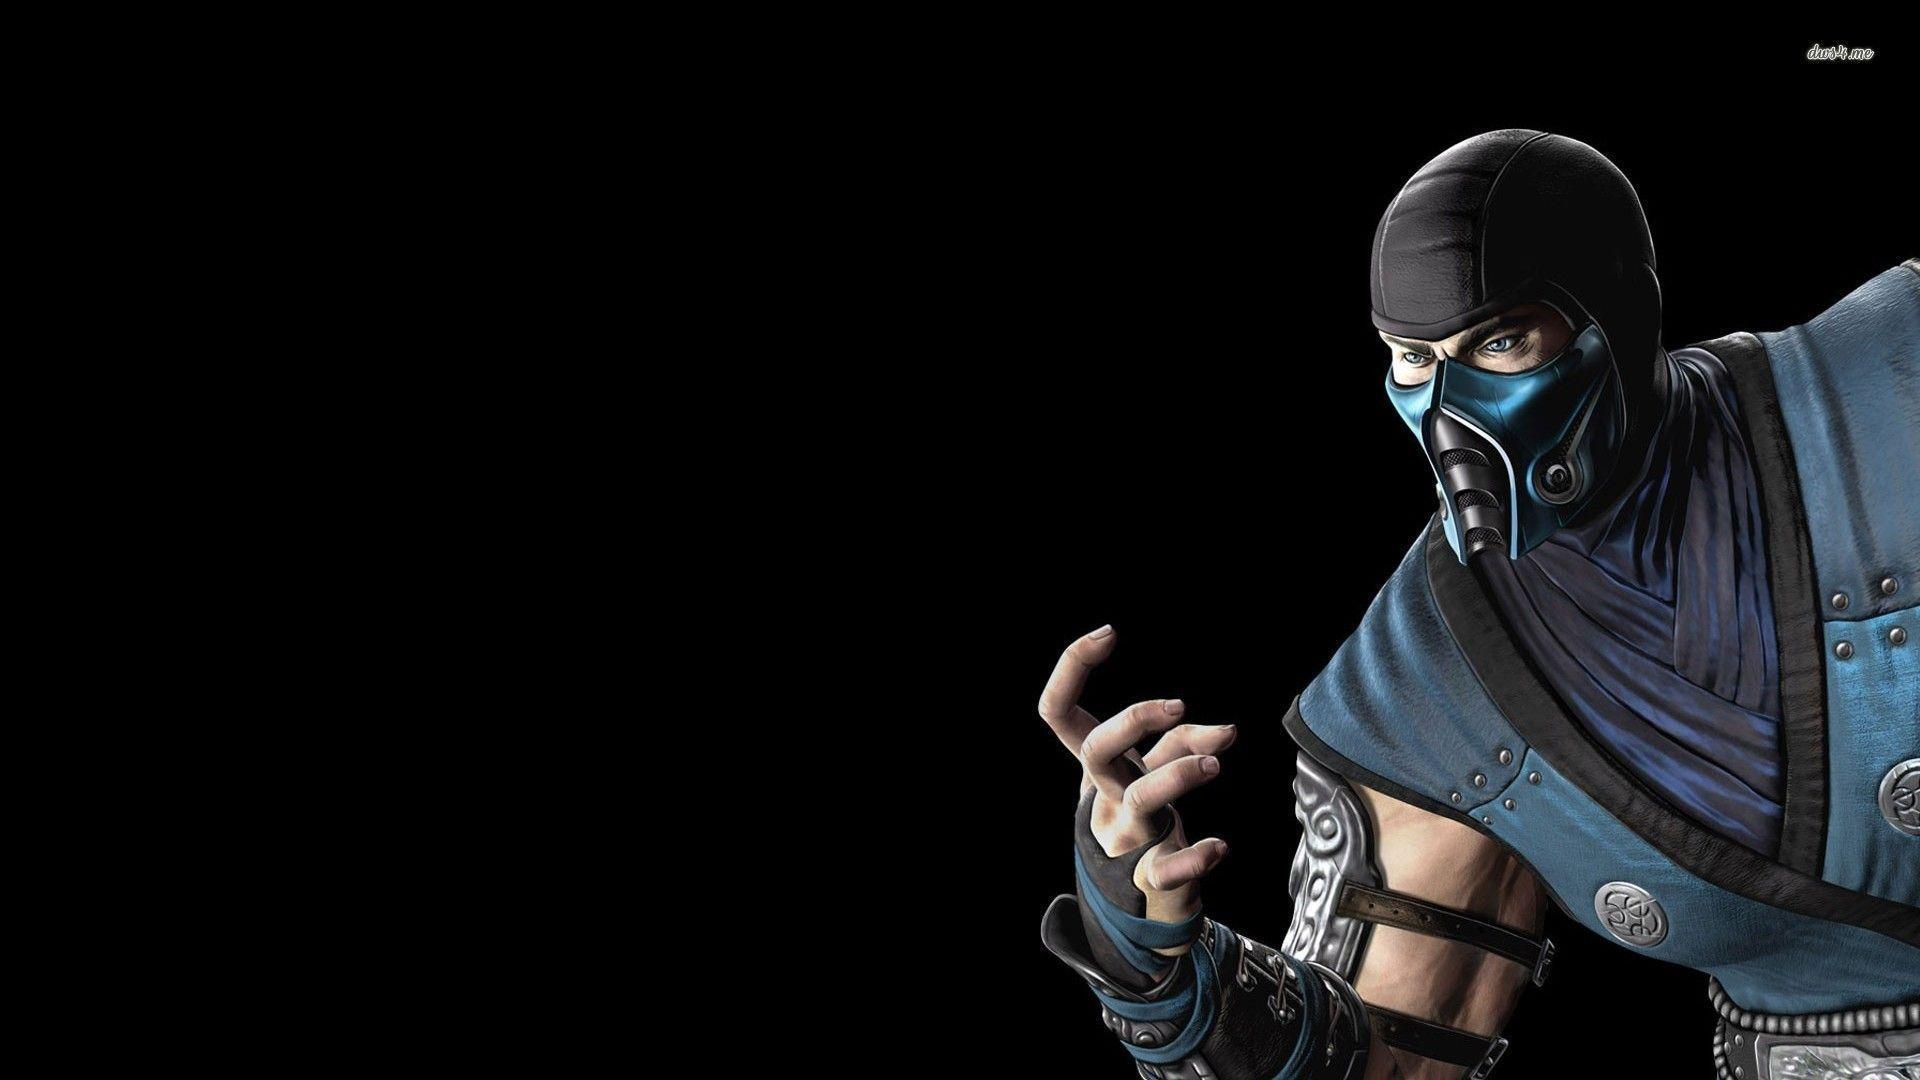 Mortal kombat wallpaper cyber sub zero